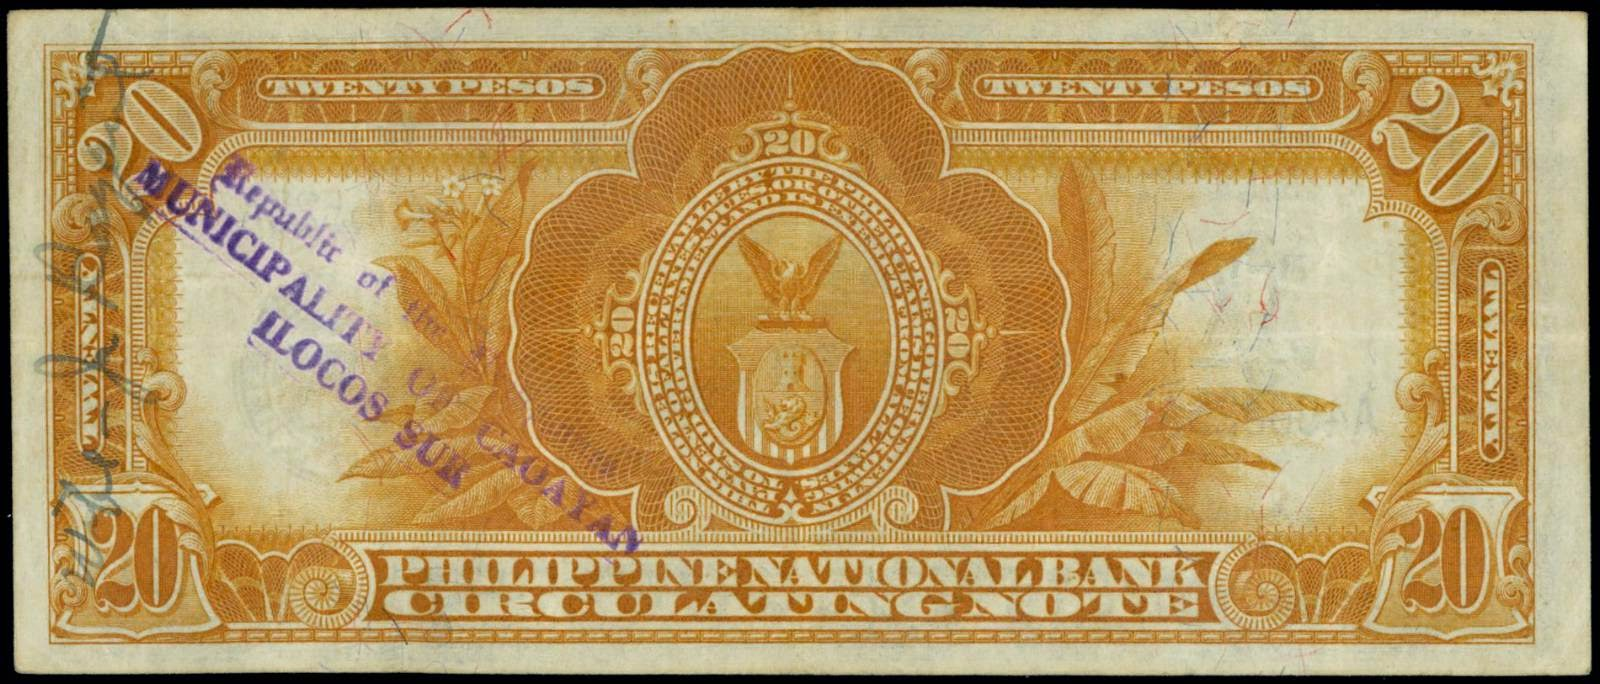 1919 Philippine National Bank Twenty Pesos Circulating Note